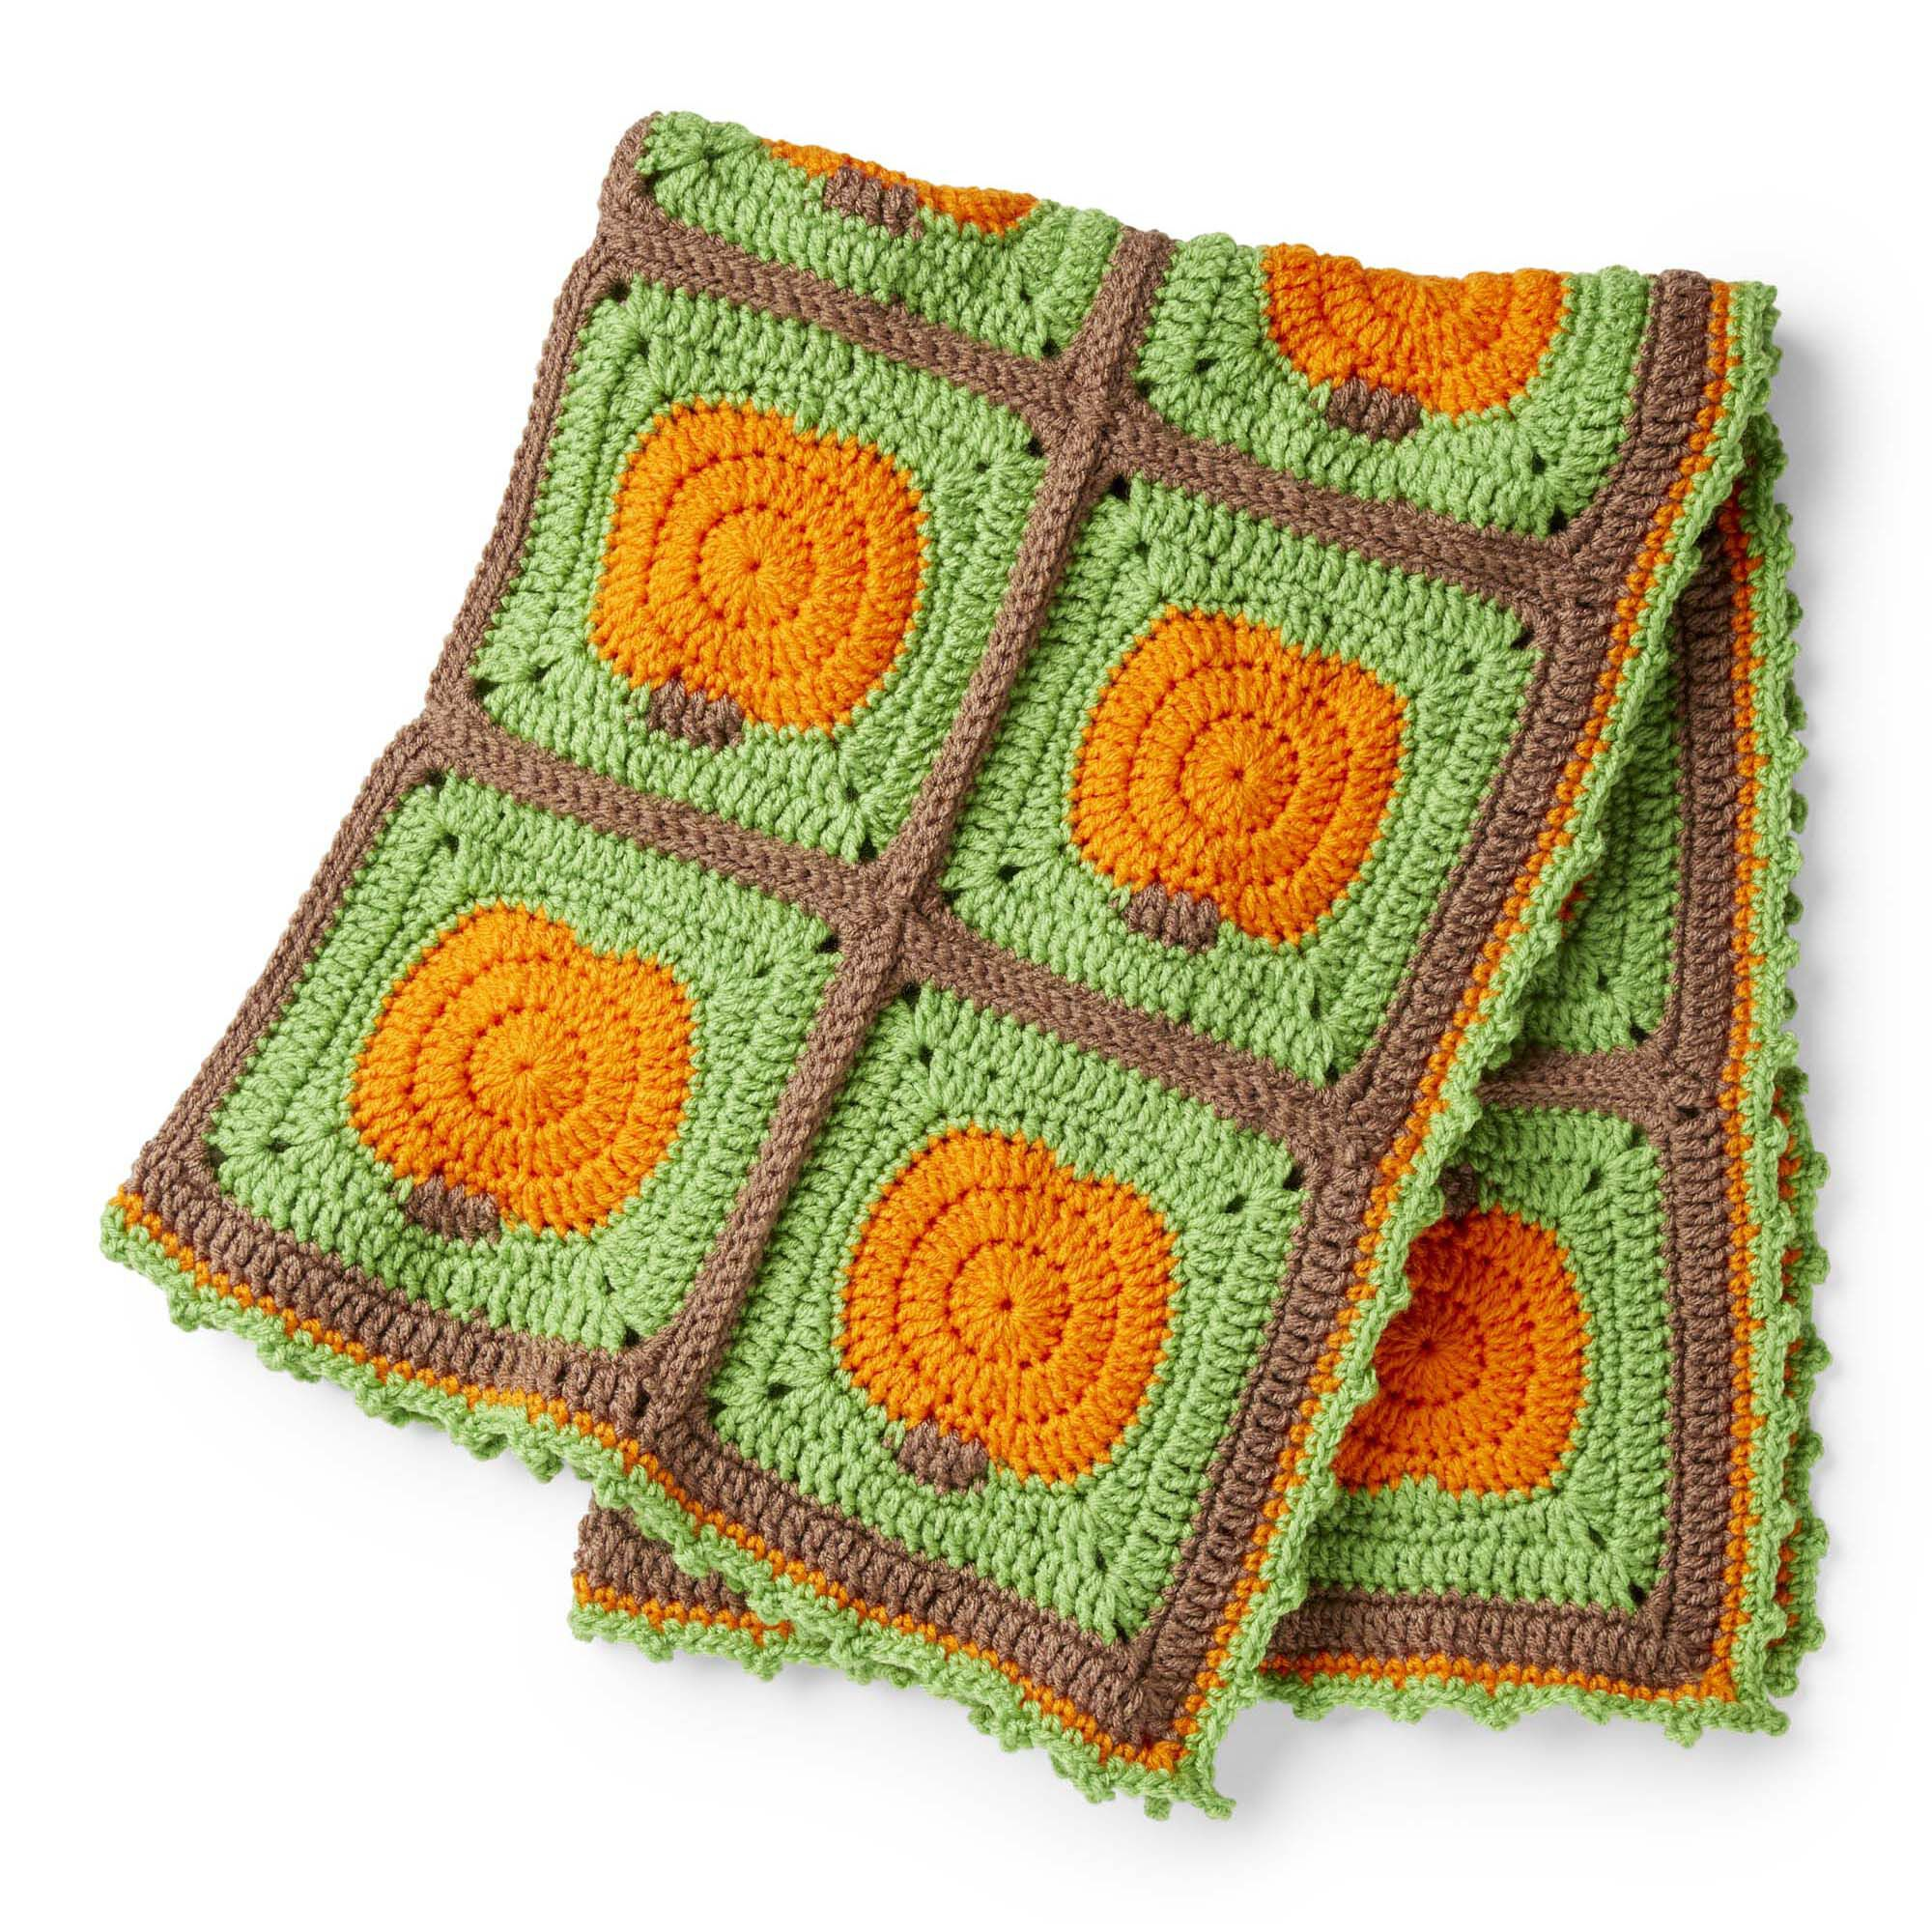 Red Heart Crochet Pumpkin Patch Blanket   Yarnspirations